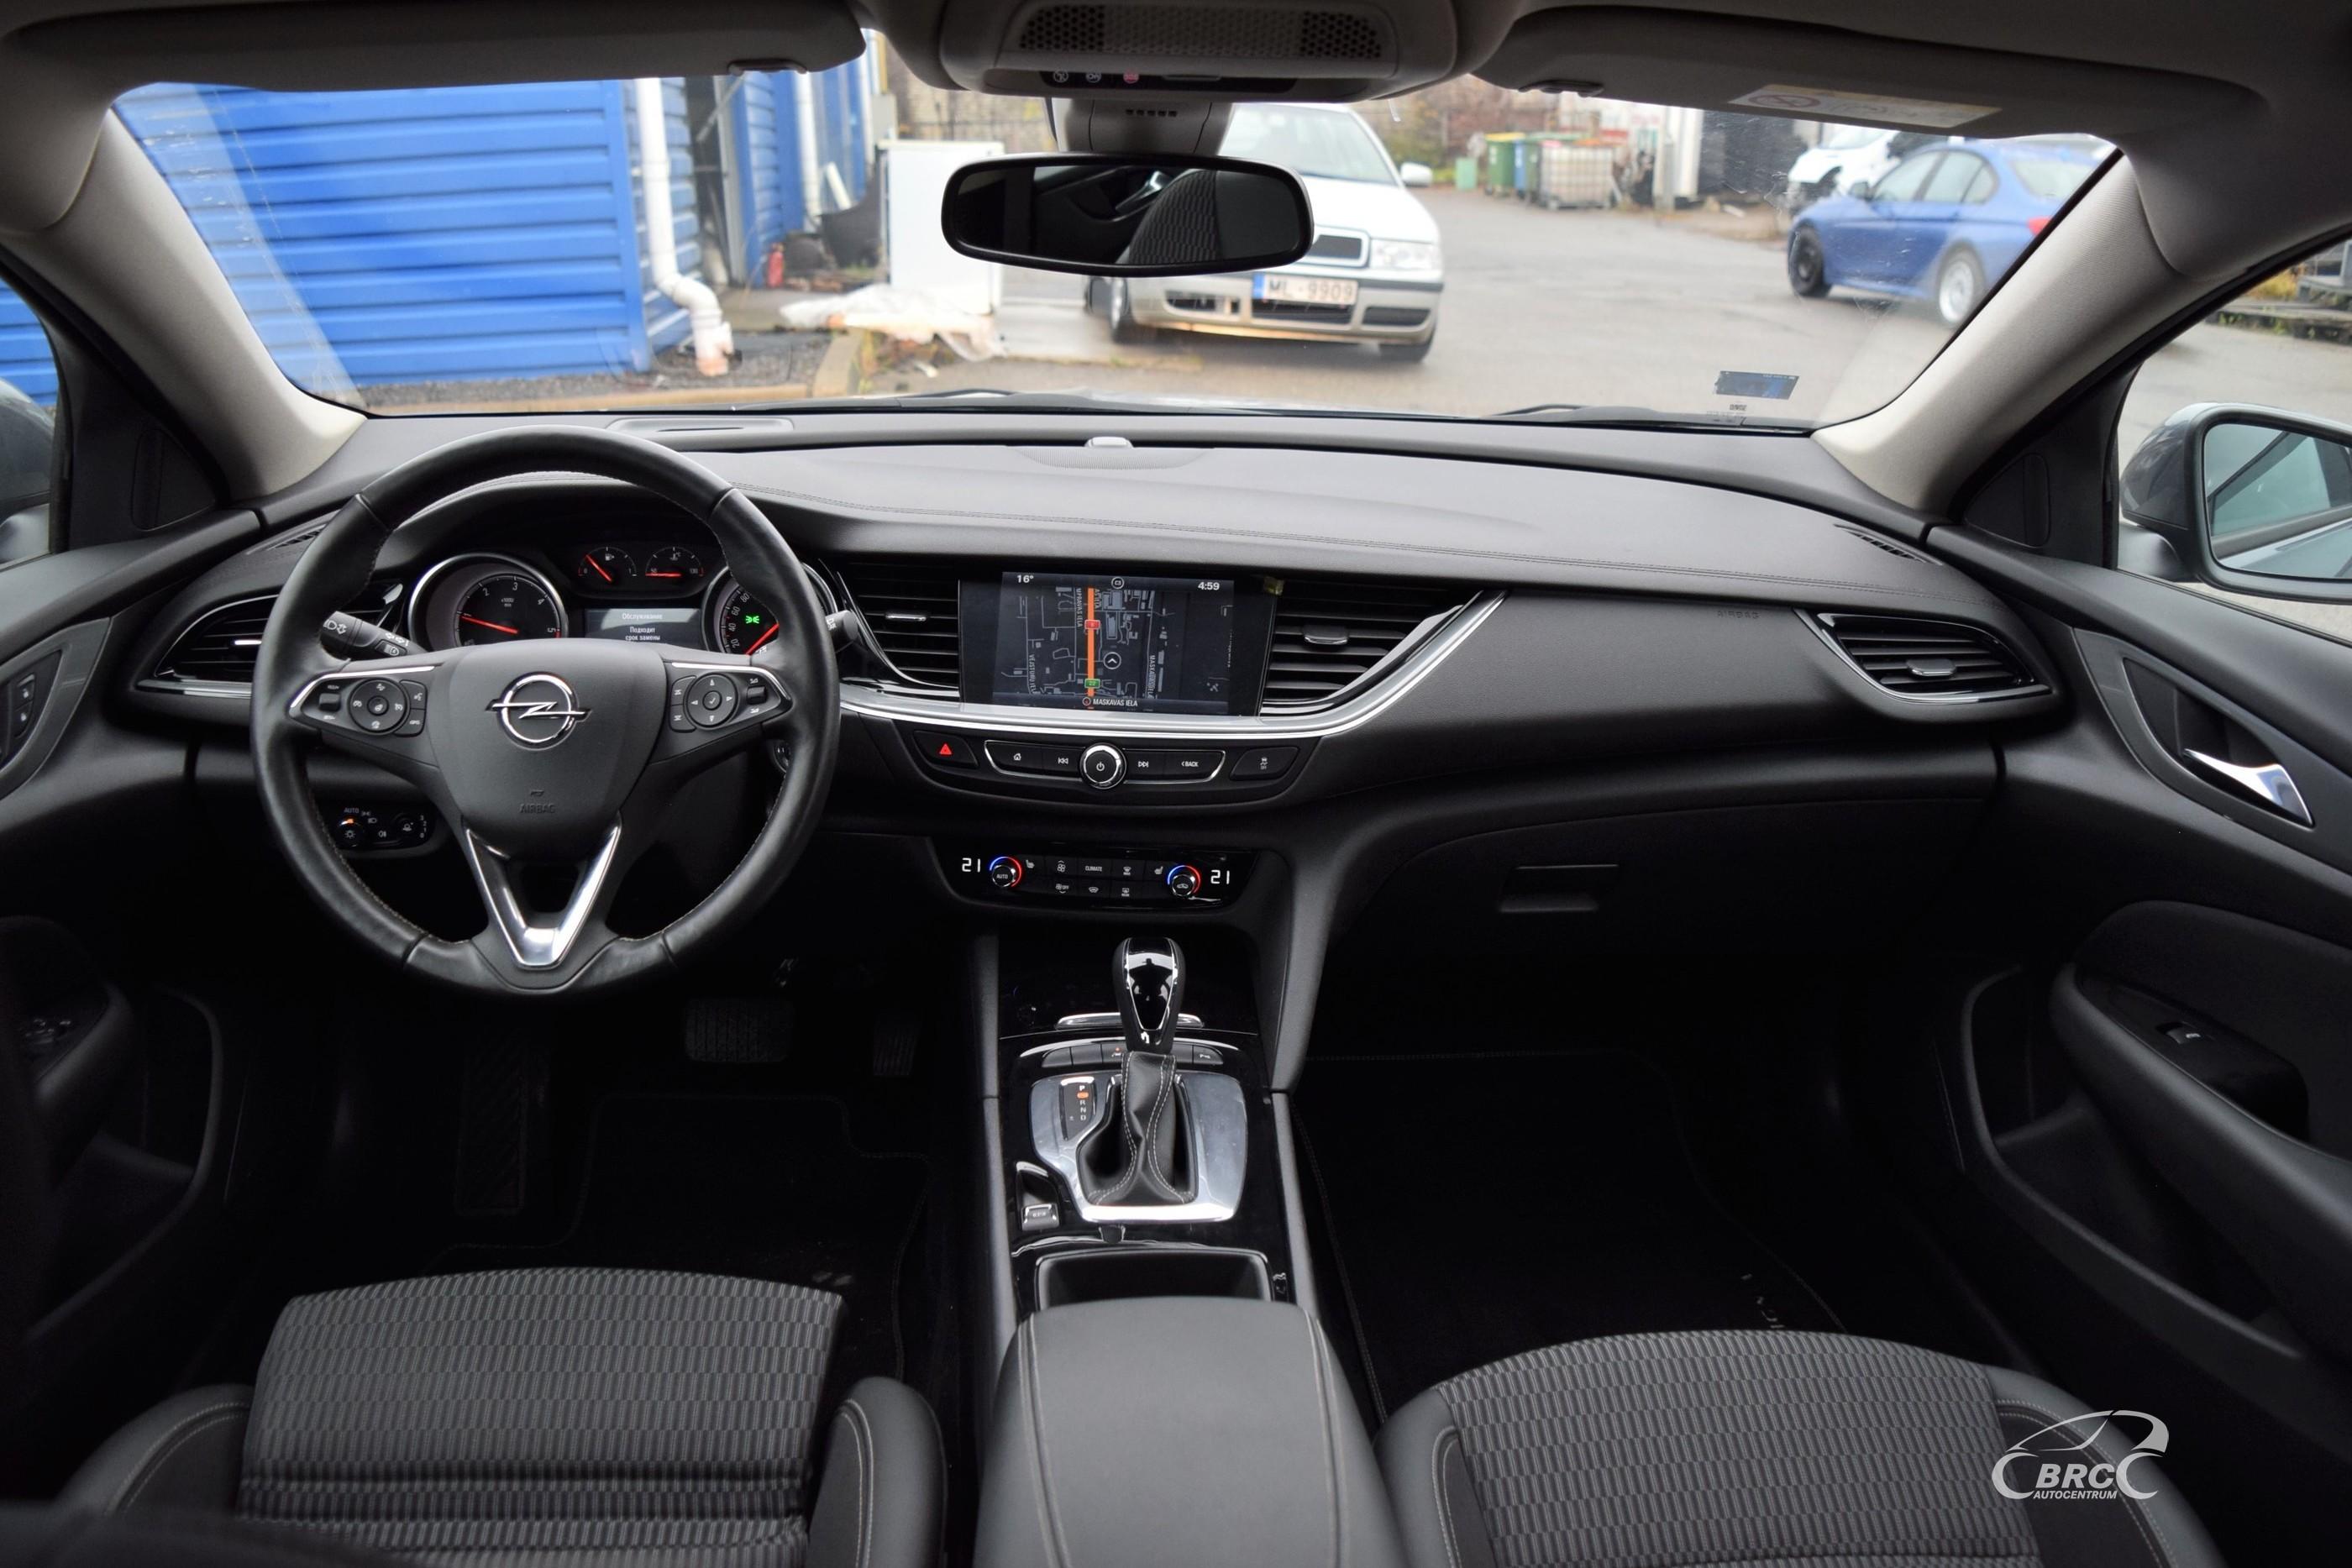 Opel Insignia Grand Sport Turbo A/T